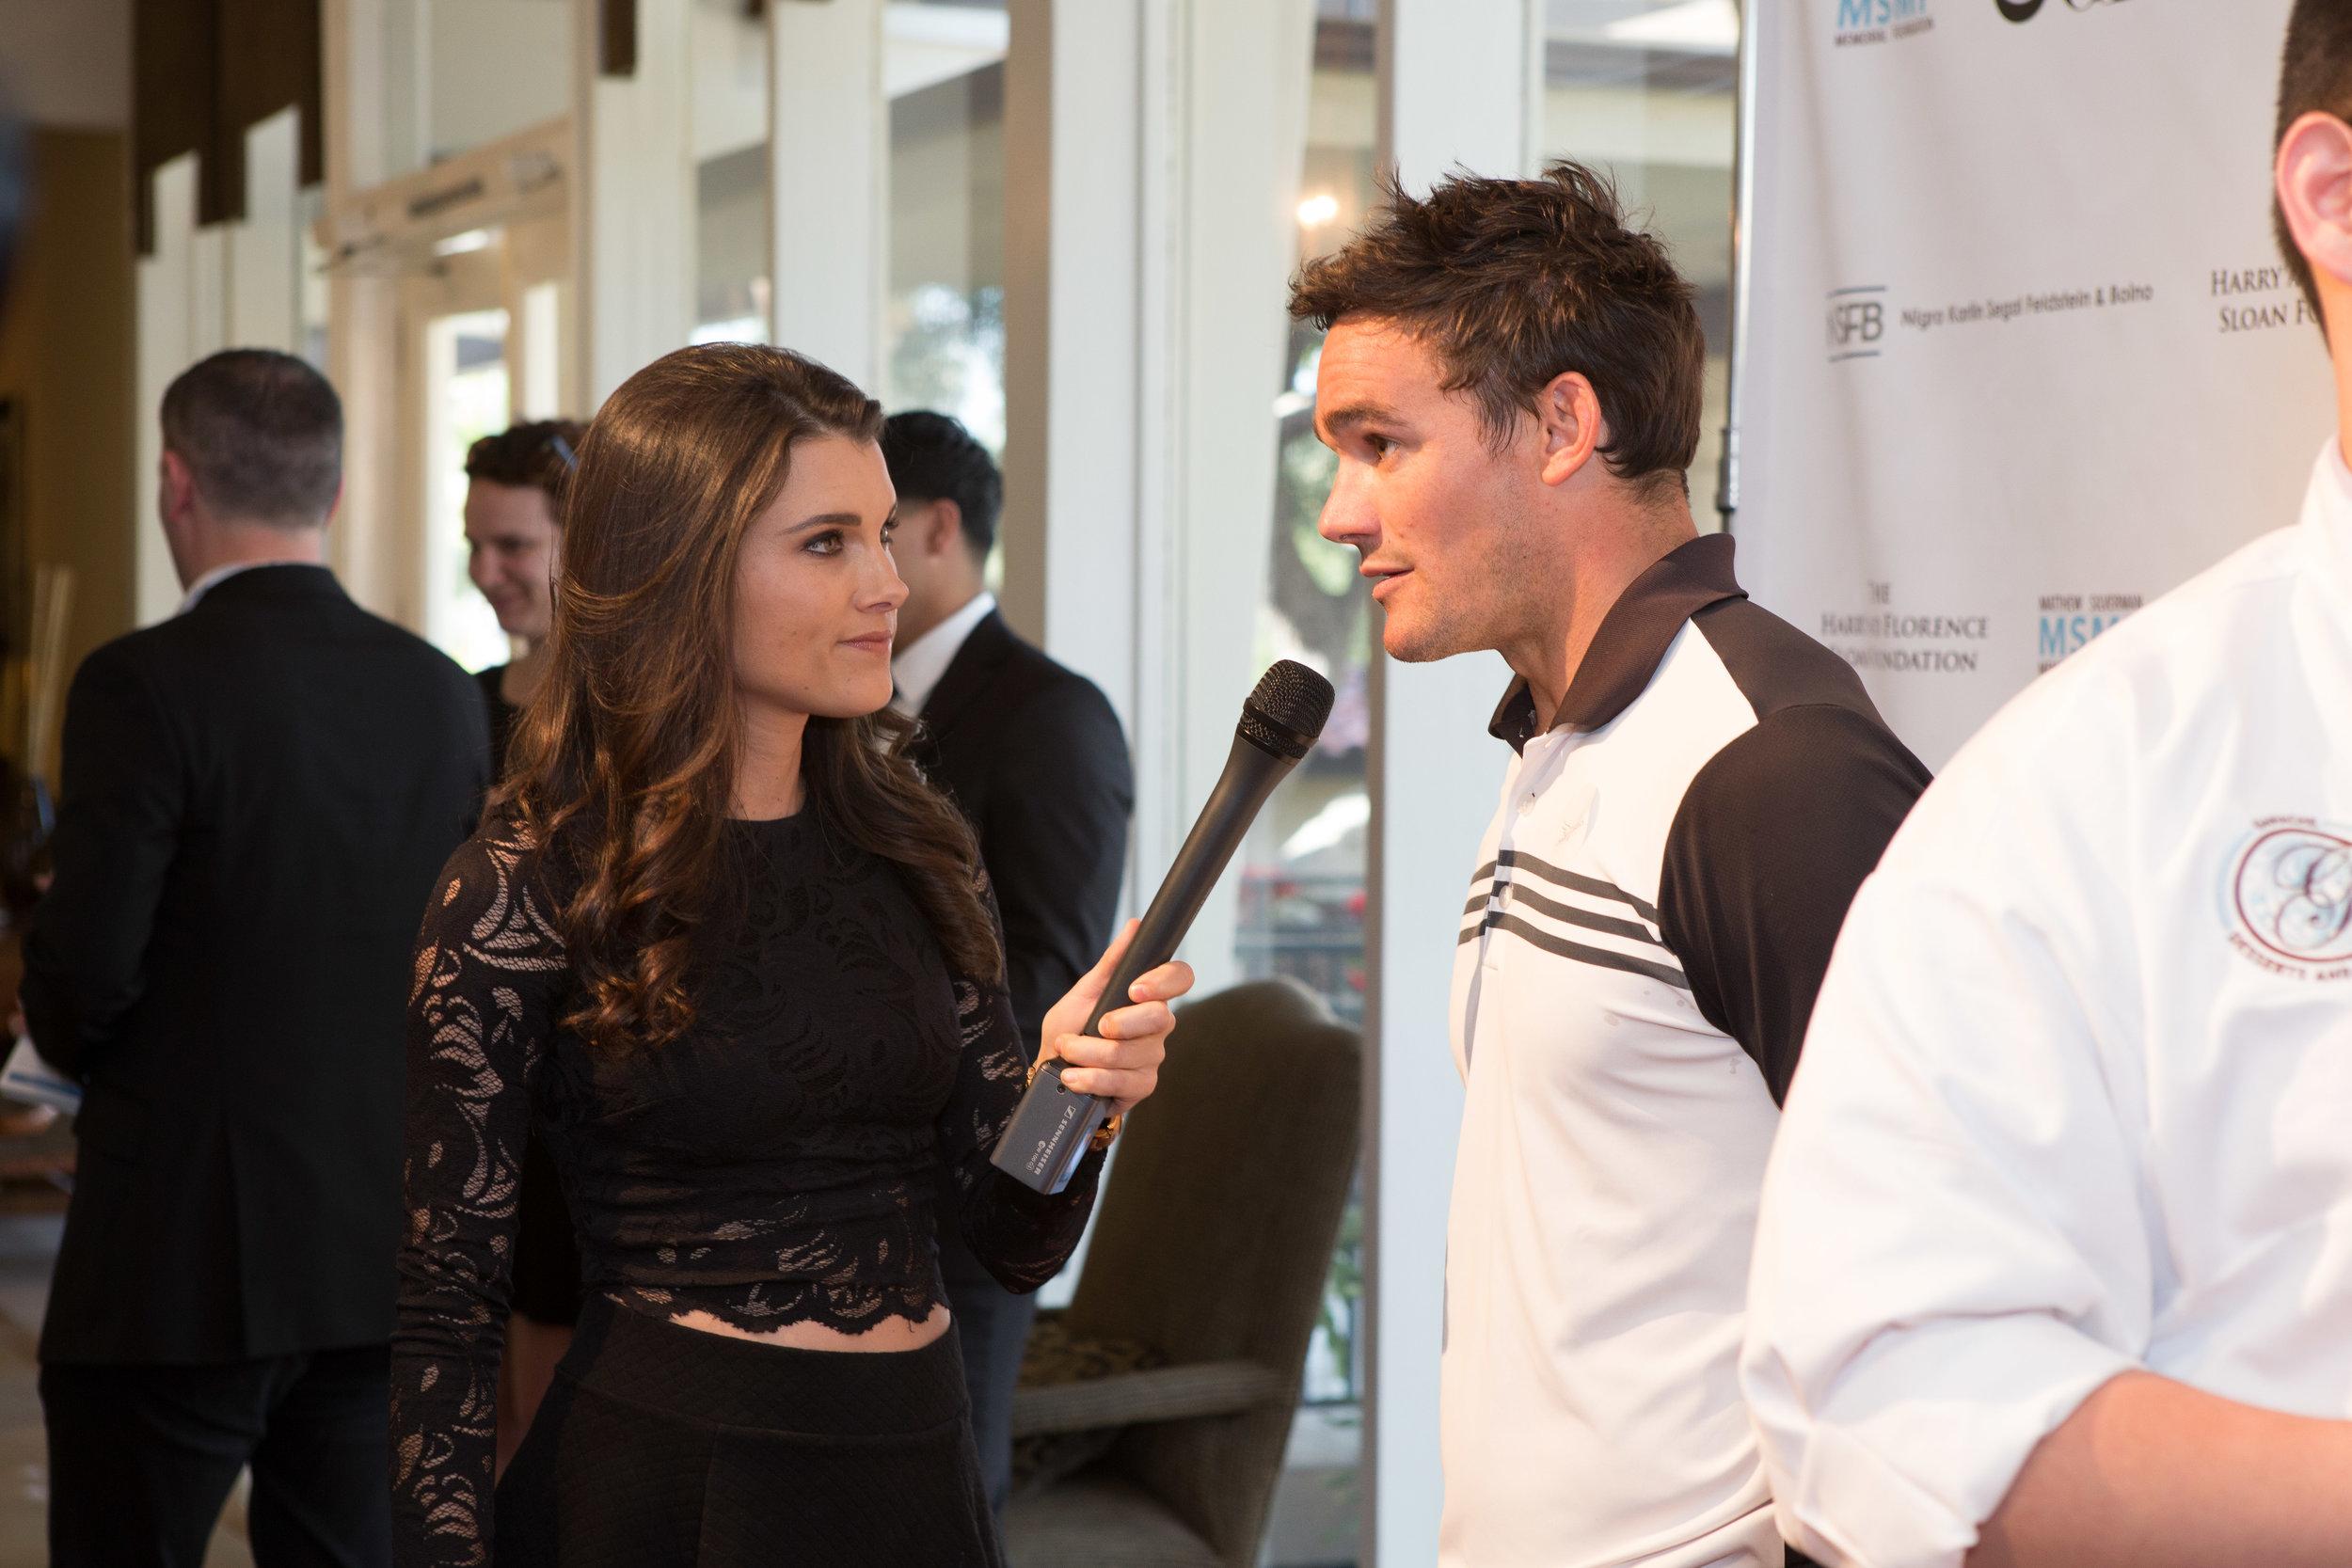 IMG_8179-Dana interviewing Max Evans (CELEBRITY).jpg